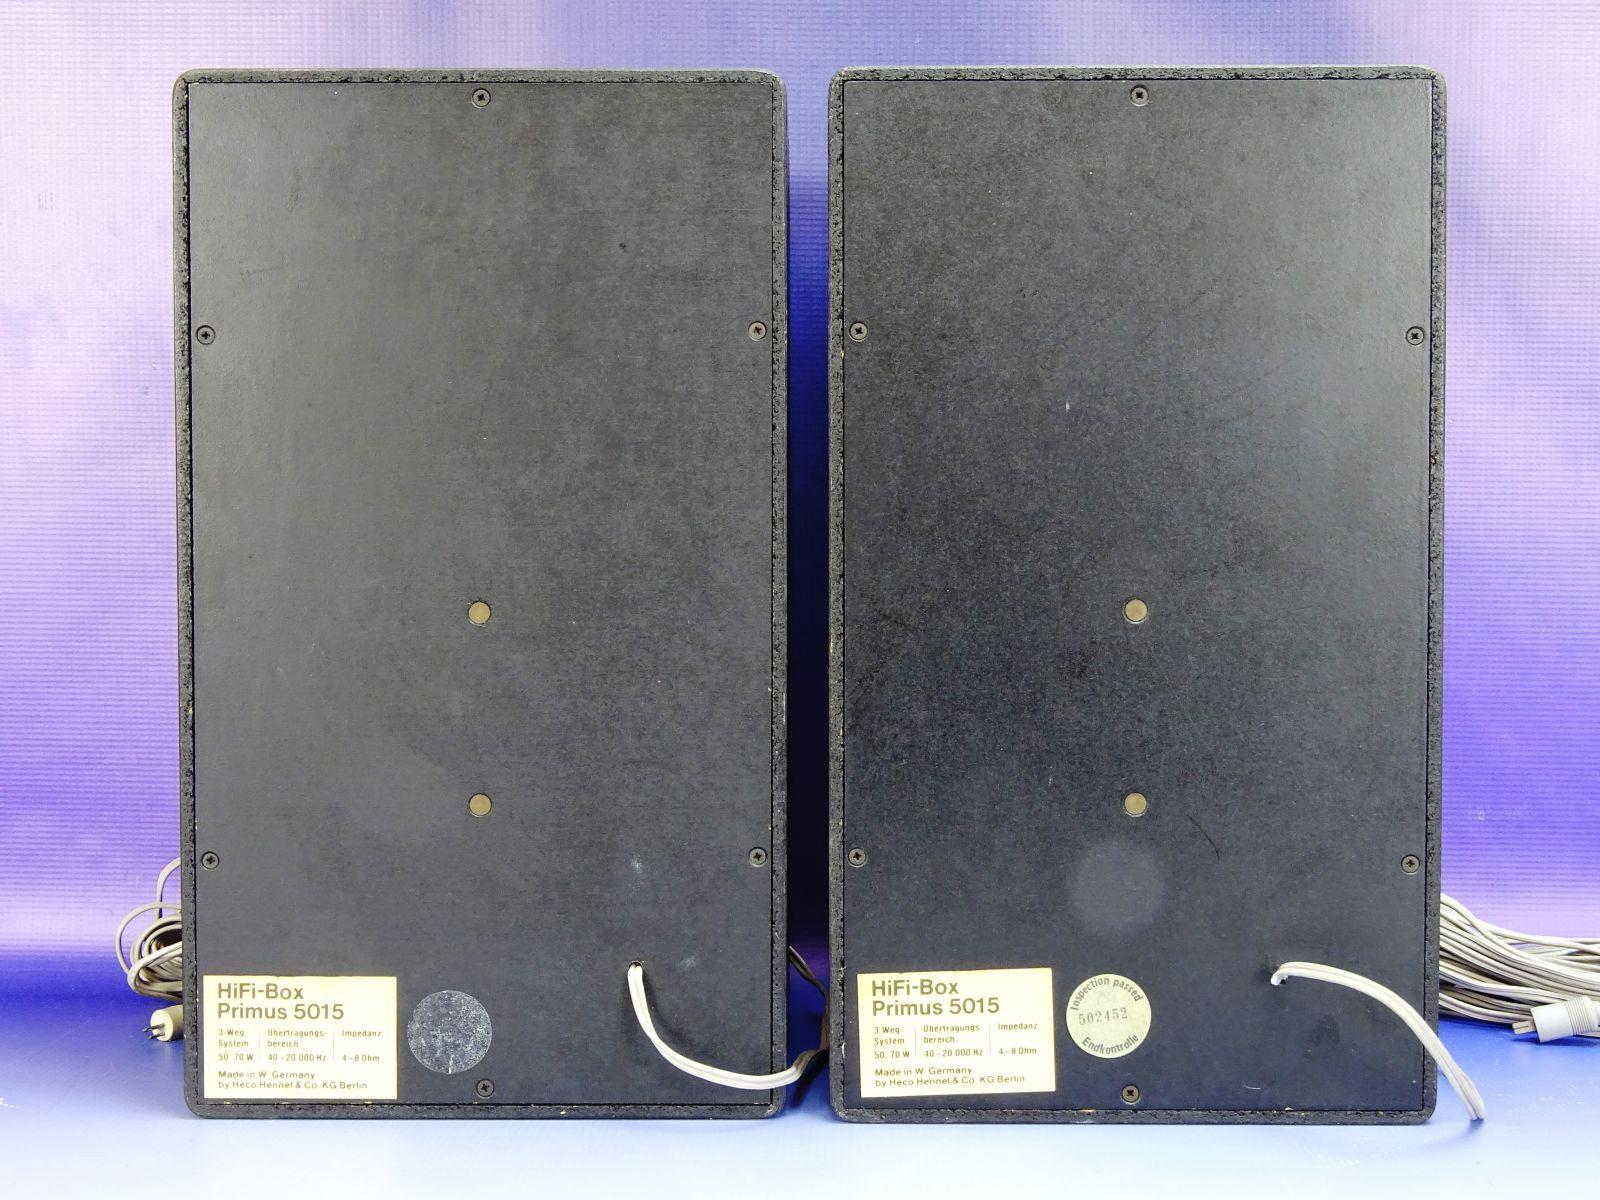 DSC02587.JPG (1600�1200)